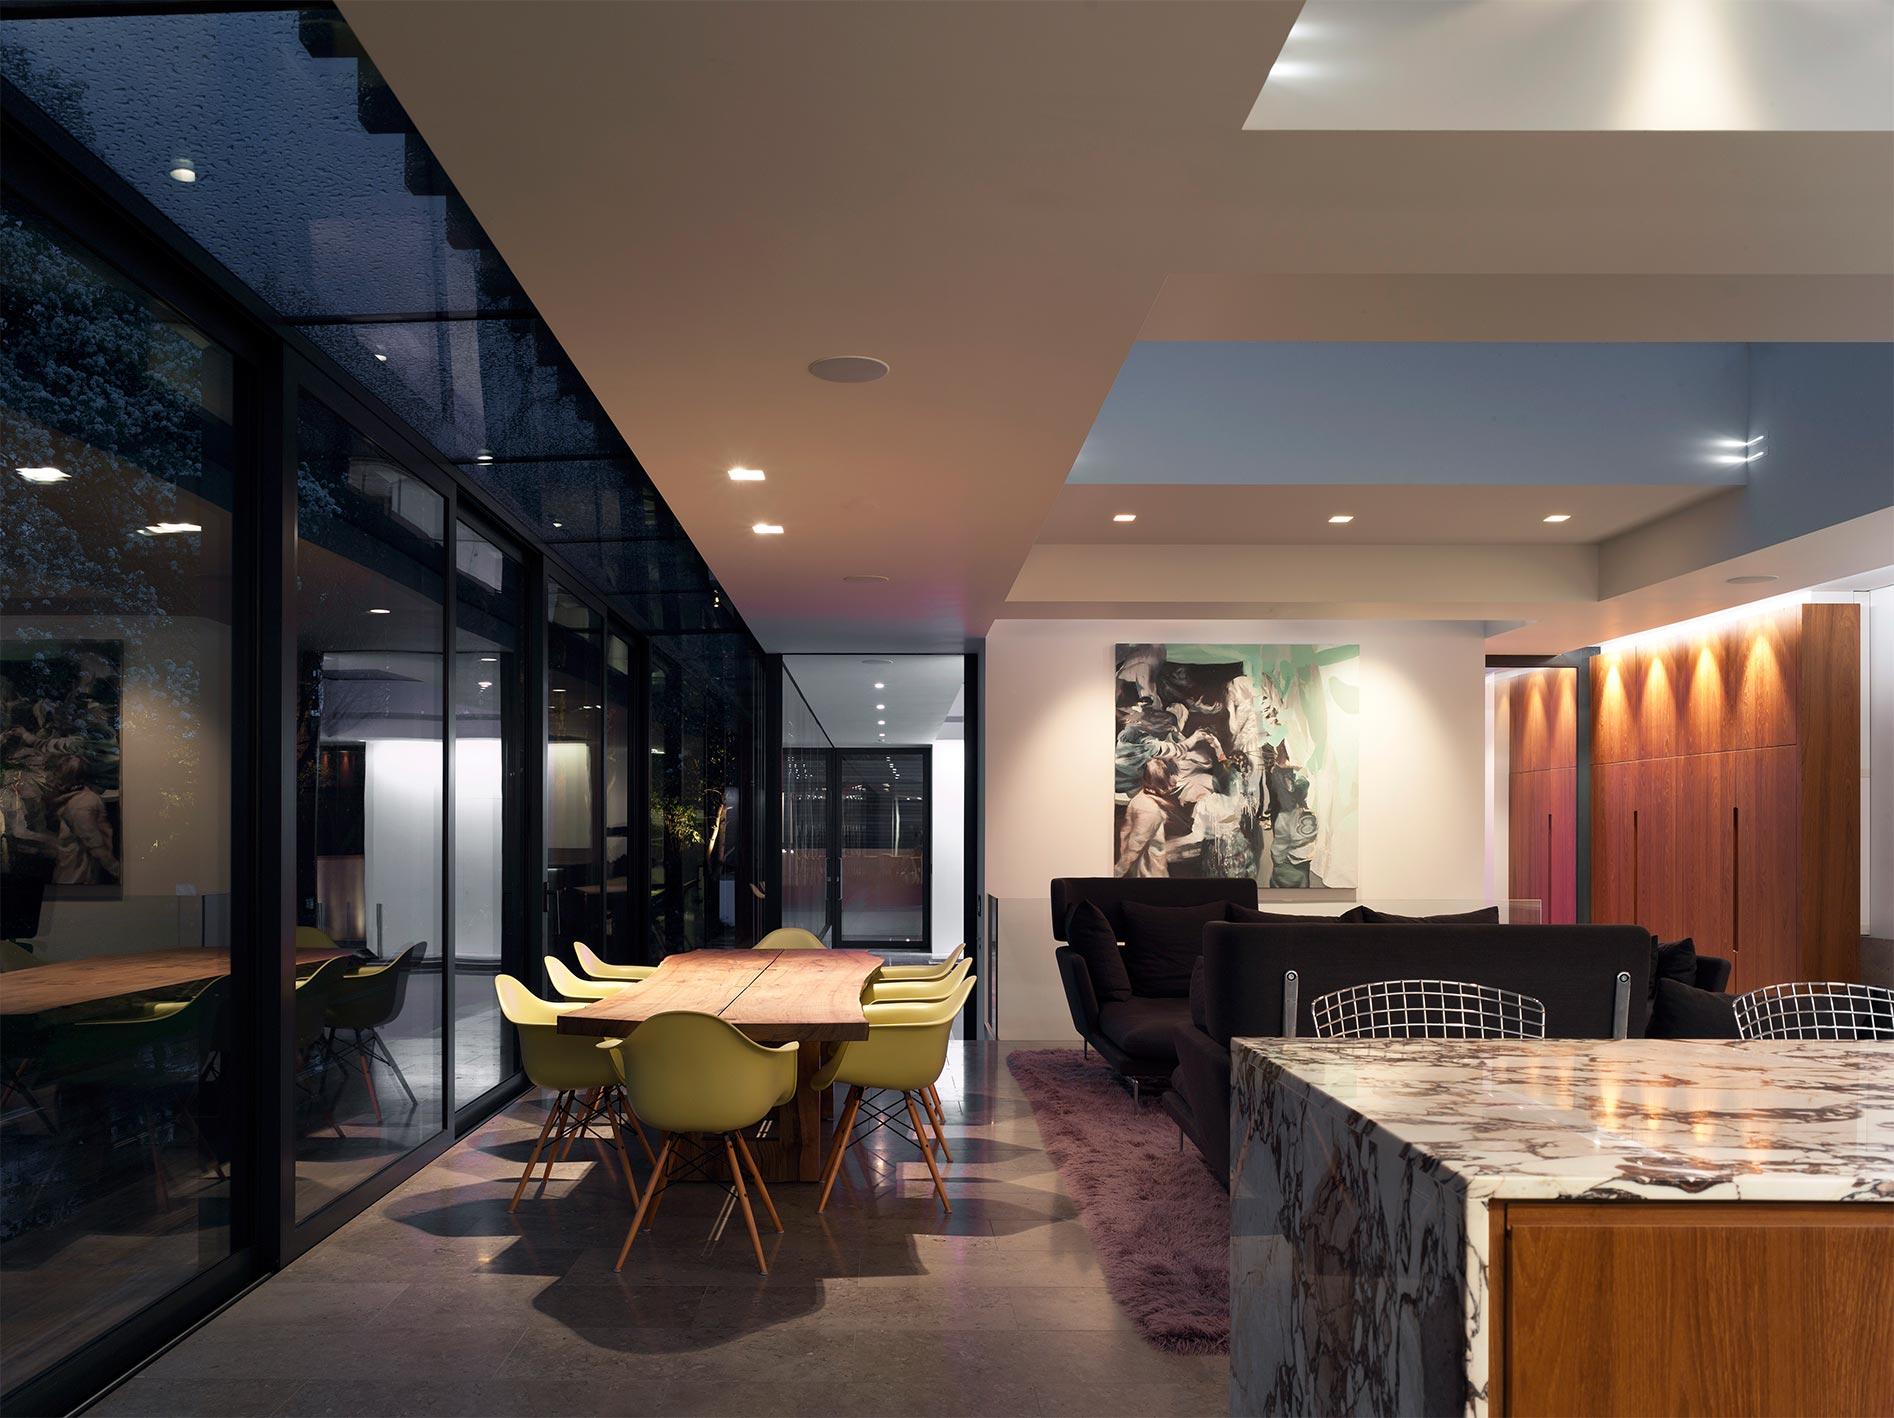 The Wood Interior Lighting